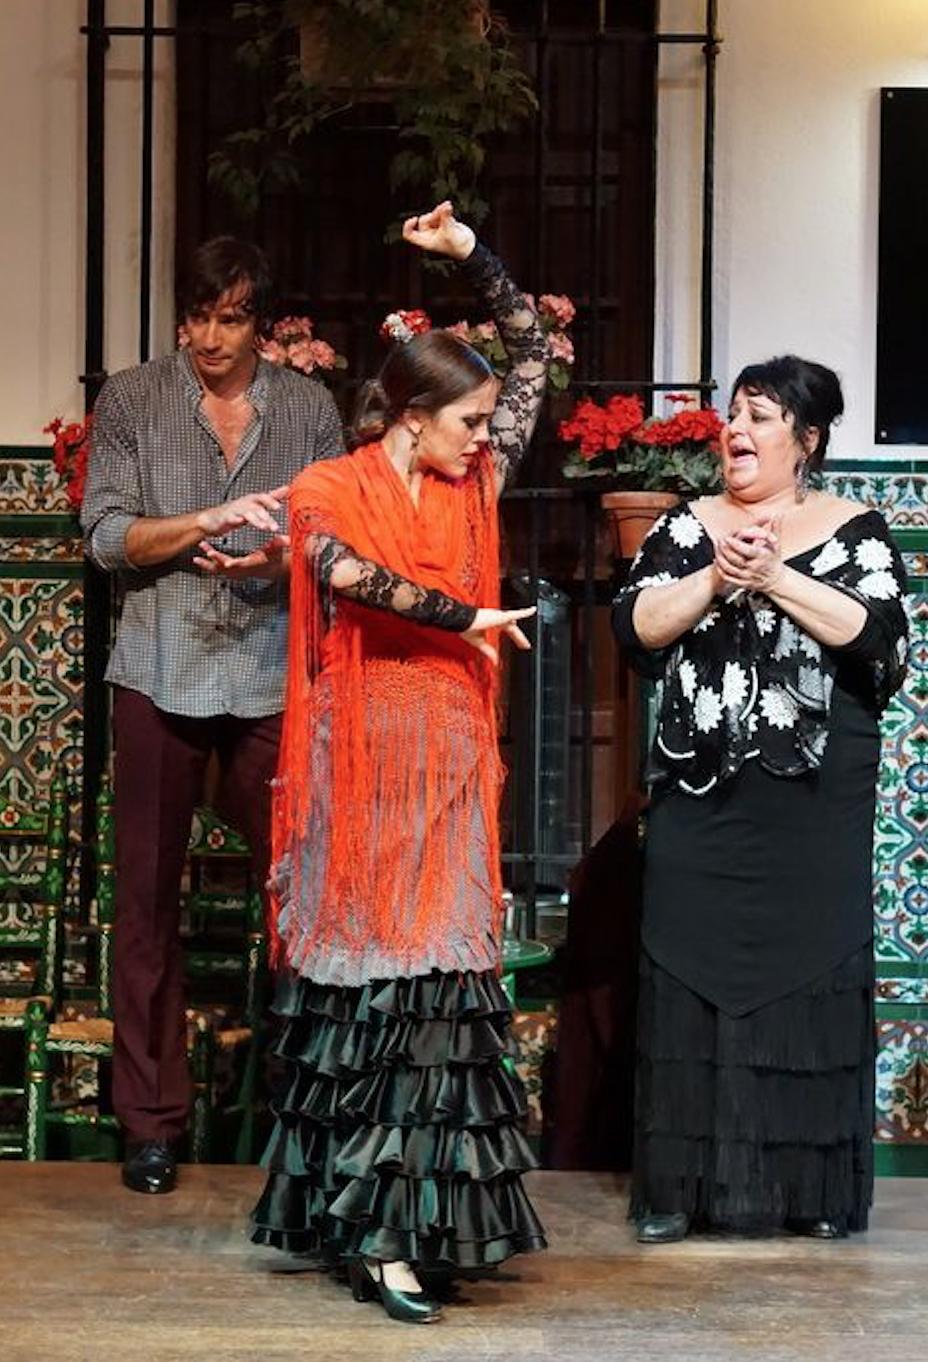 A Flamenco dancer in a small Sevillian bar - she was mesmerizing!